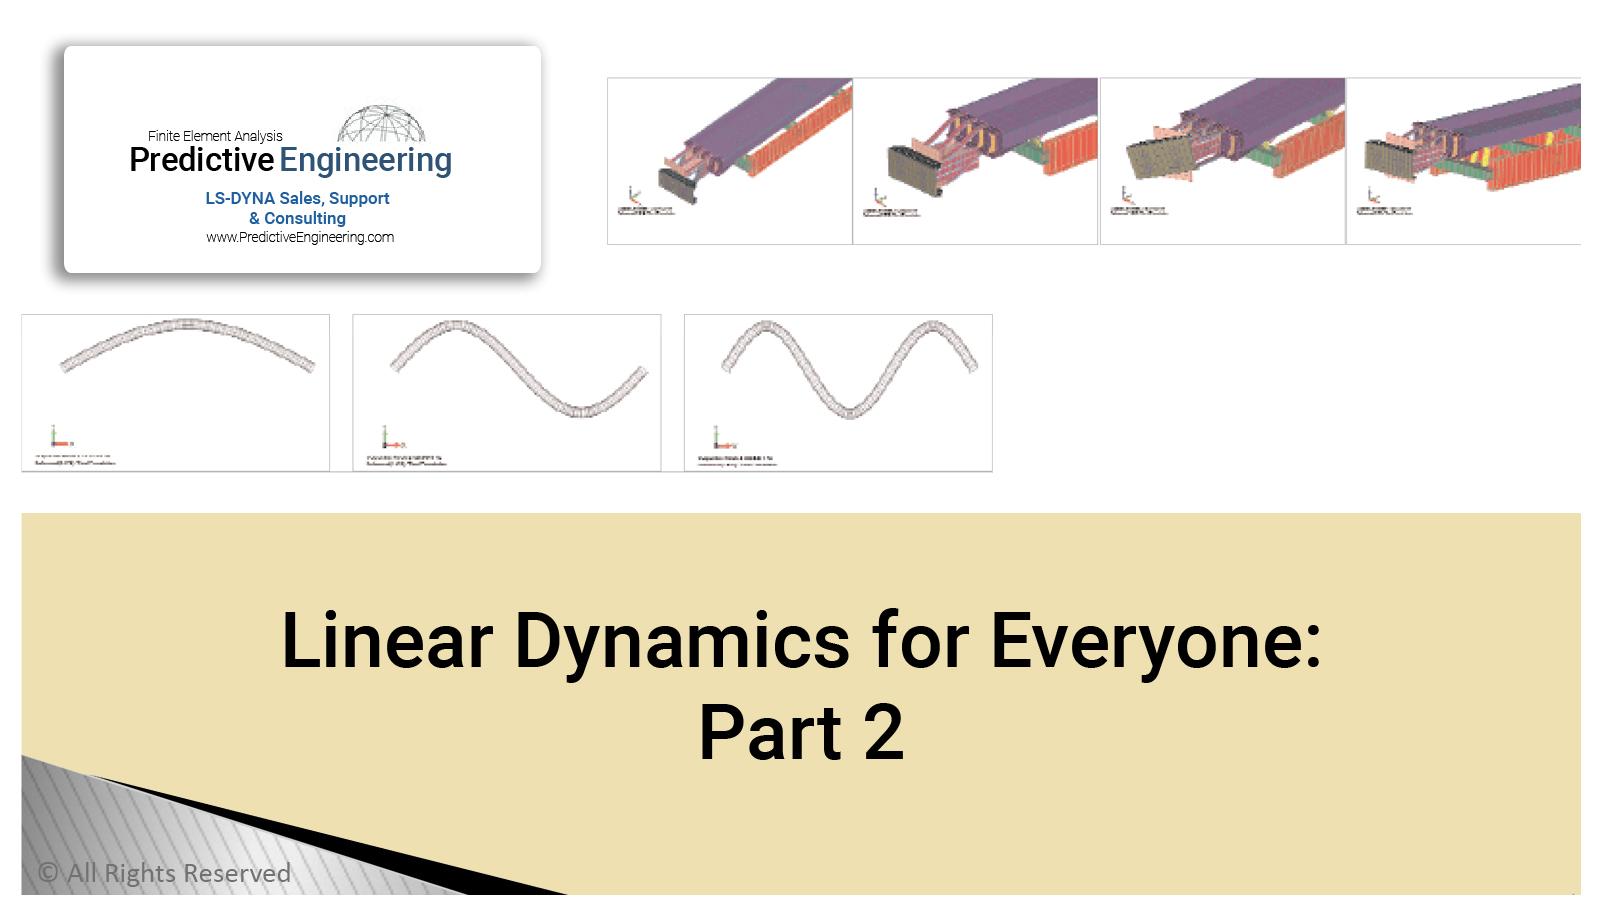 Linear Dynamics part 2